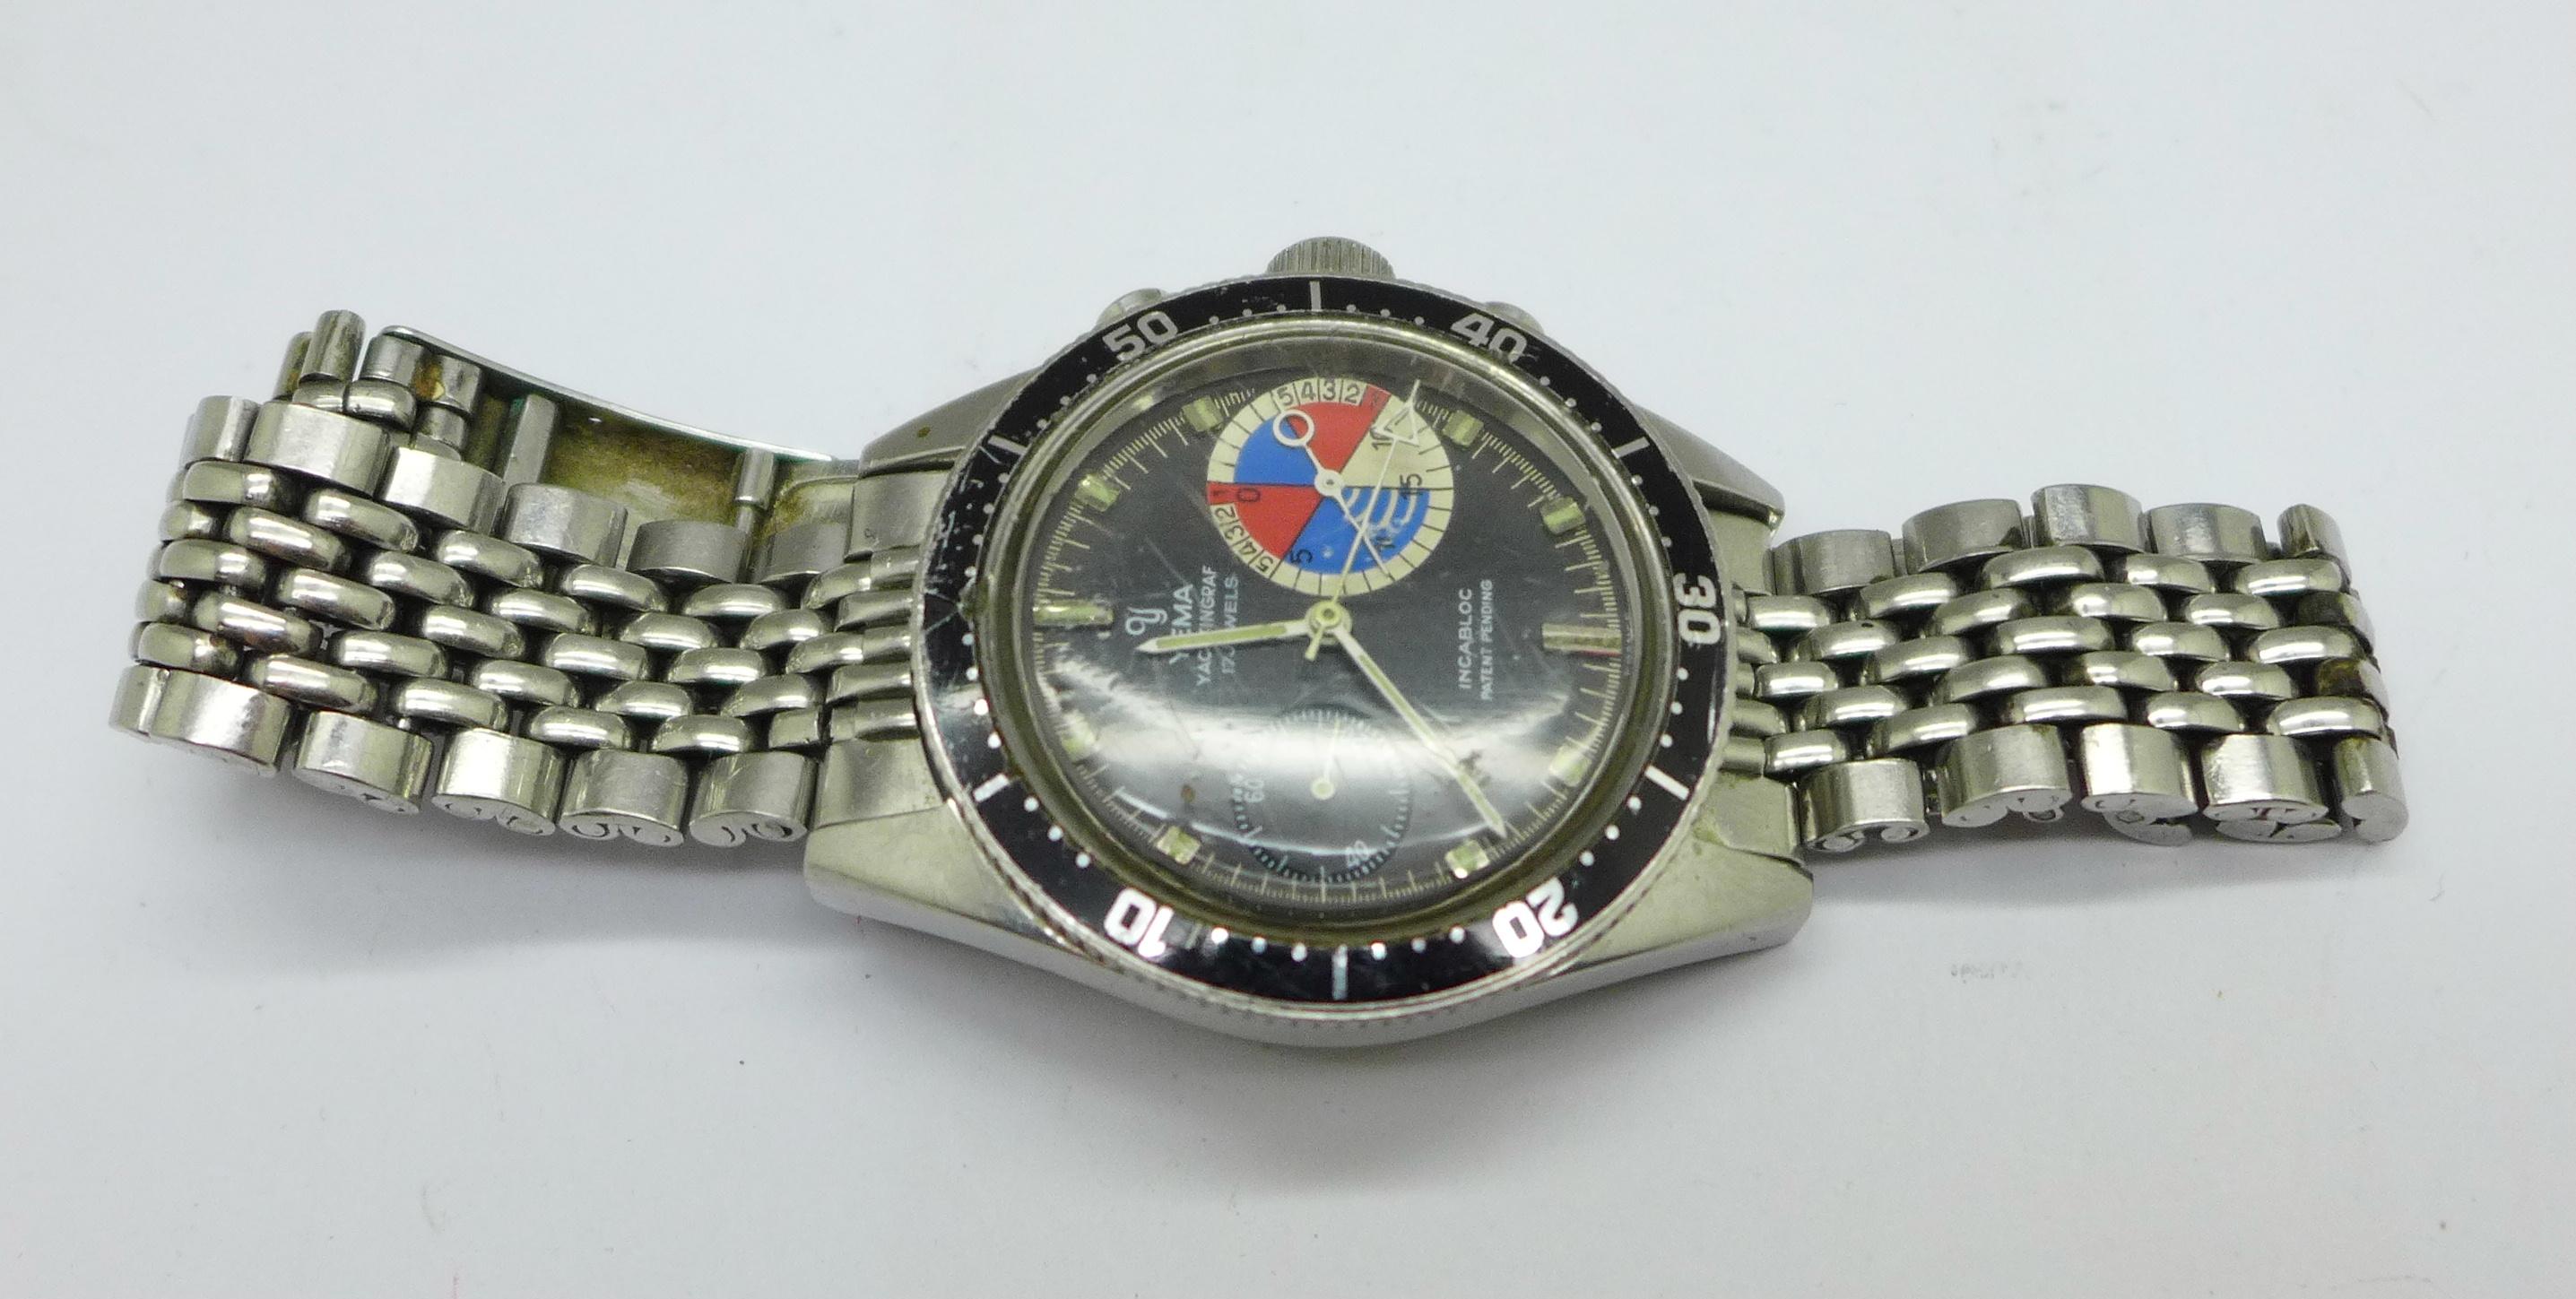 A Yema Yachtingraf 17 jewels chronograph wristwatch on a Seiko bracelet strap, chronograph buttons - Image 4 of 8